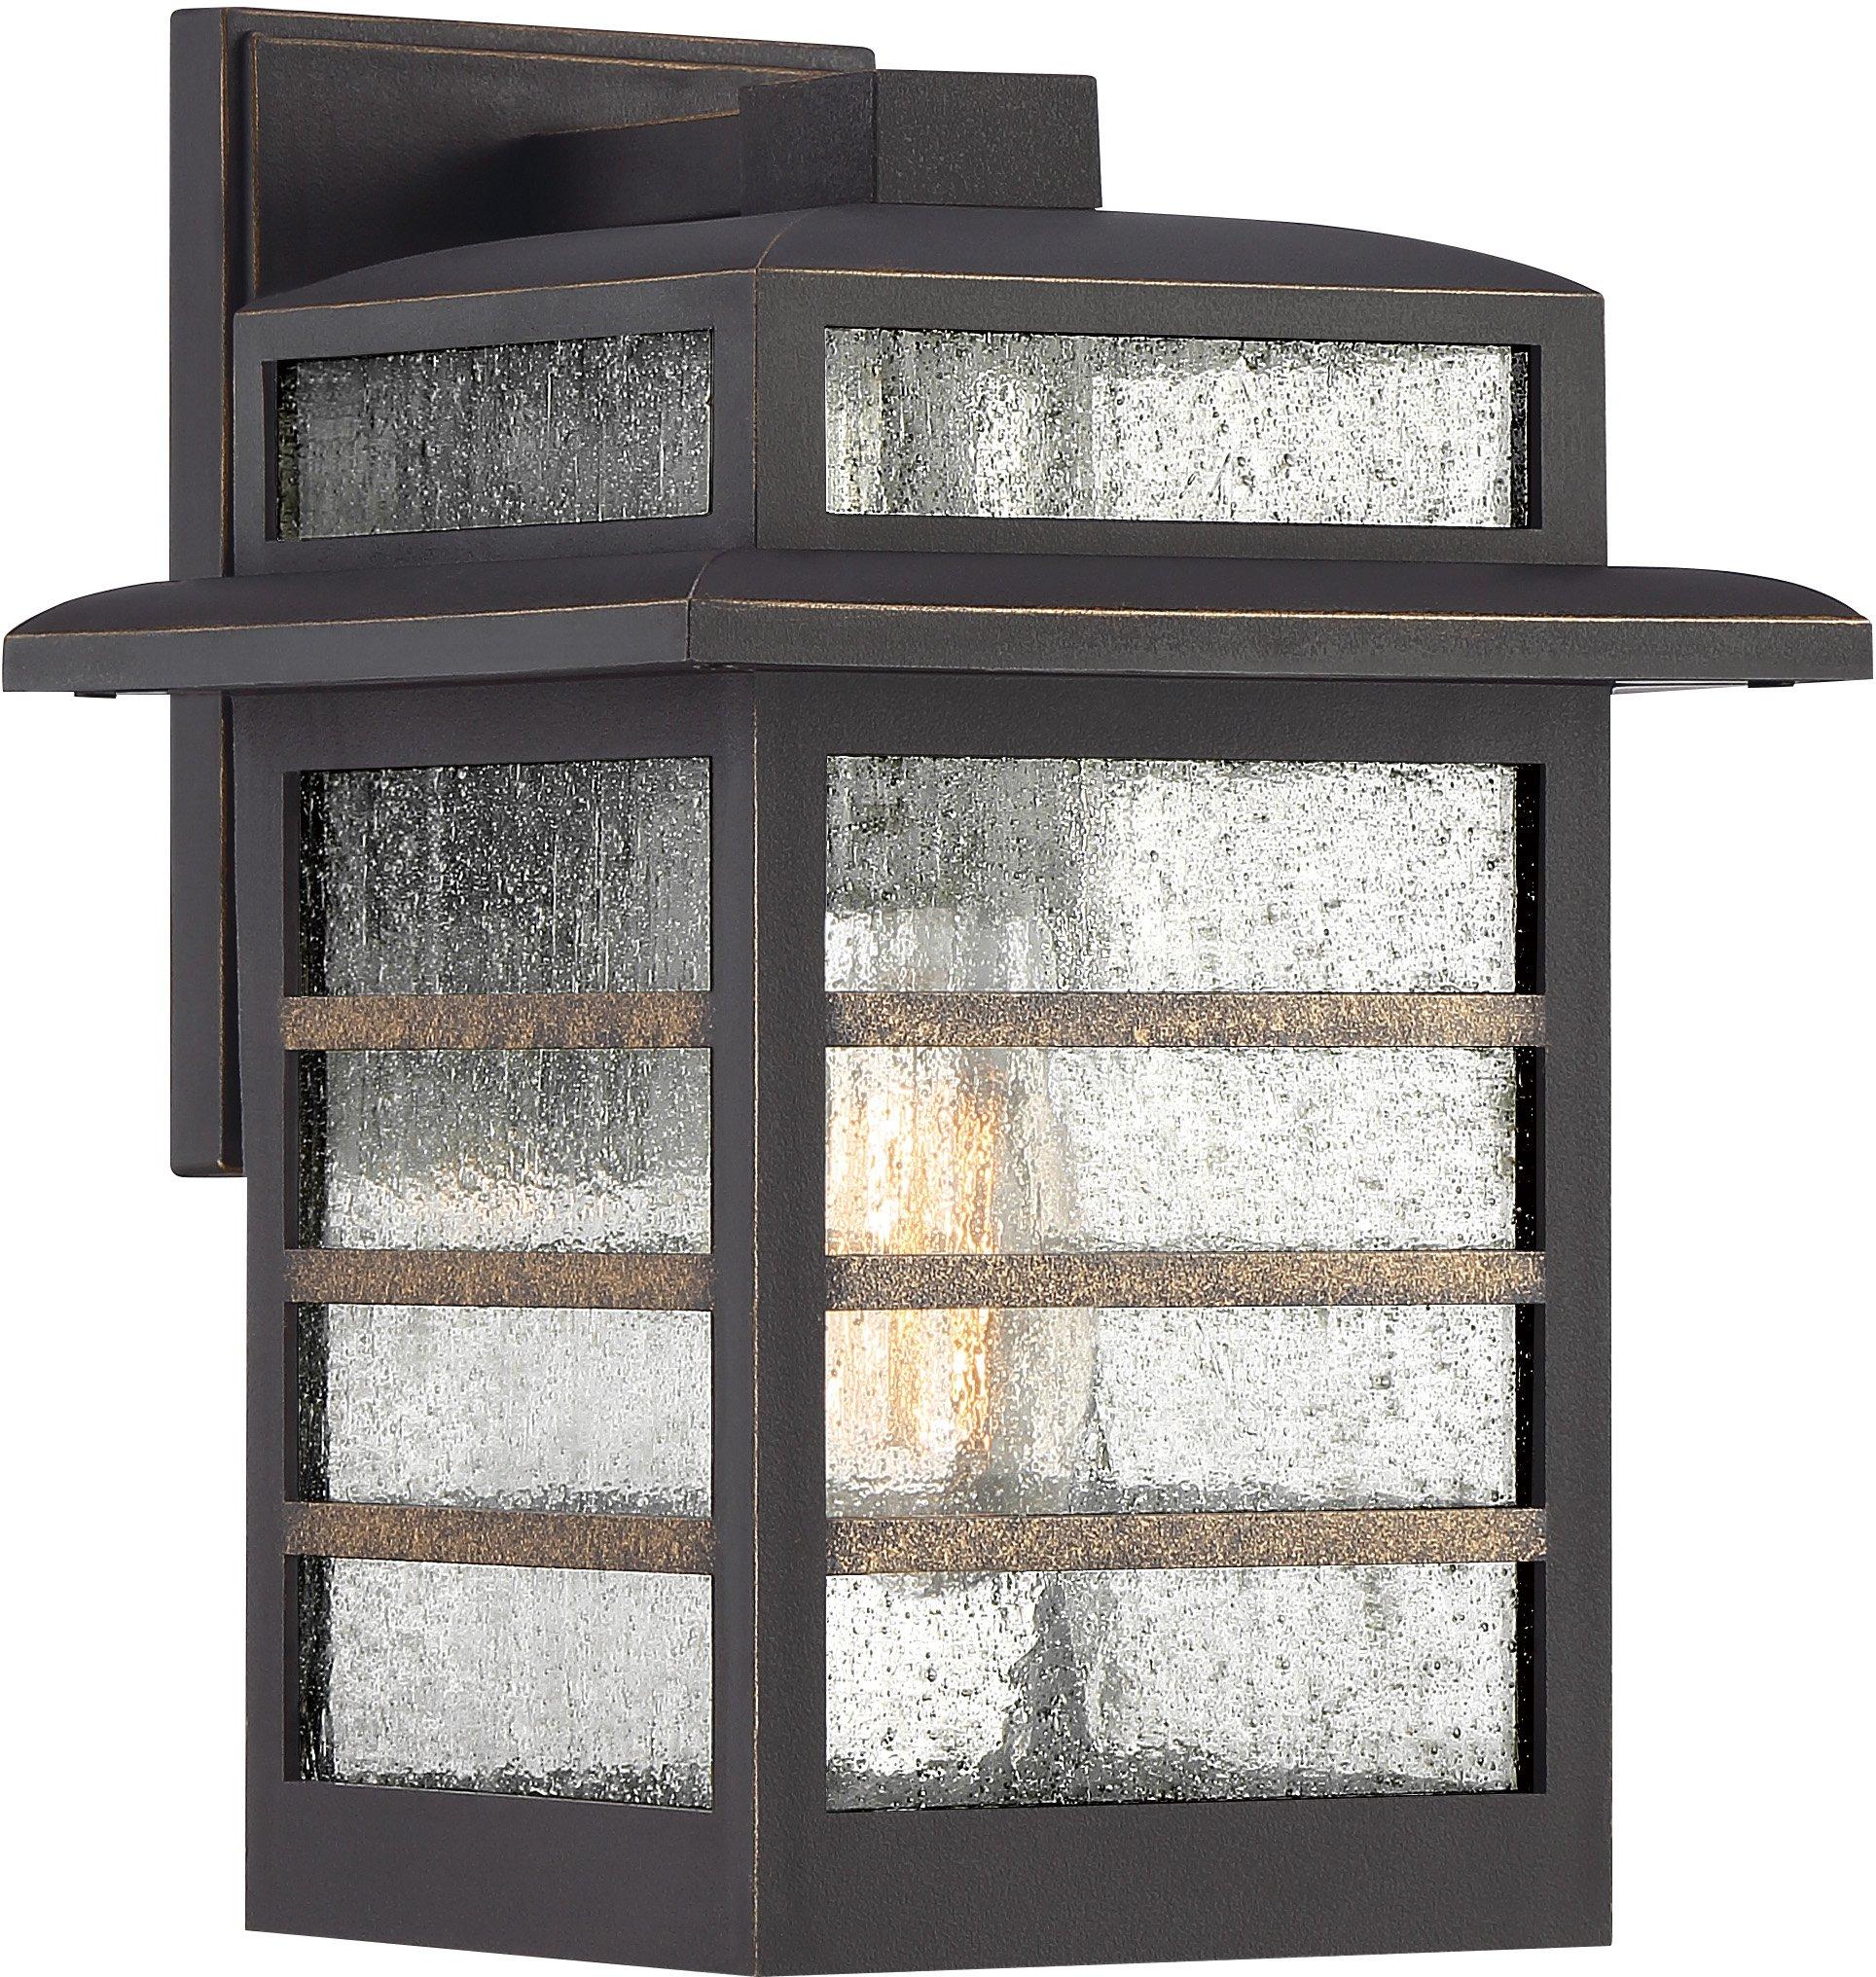 Quoizel PLA8408PN Plaza Outdoor Wall Sconce Lighting, 1-Light, 100 Watt, Palladian Bronze (12''H x 8''W)